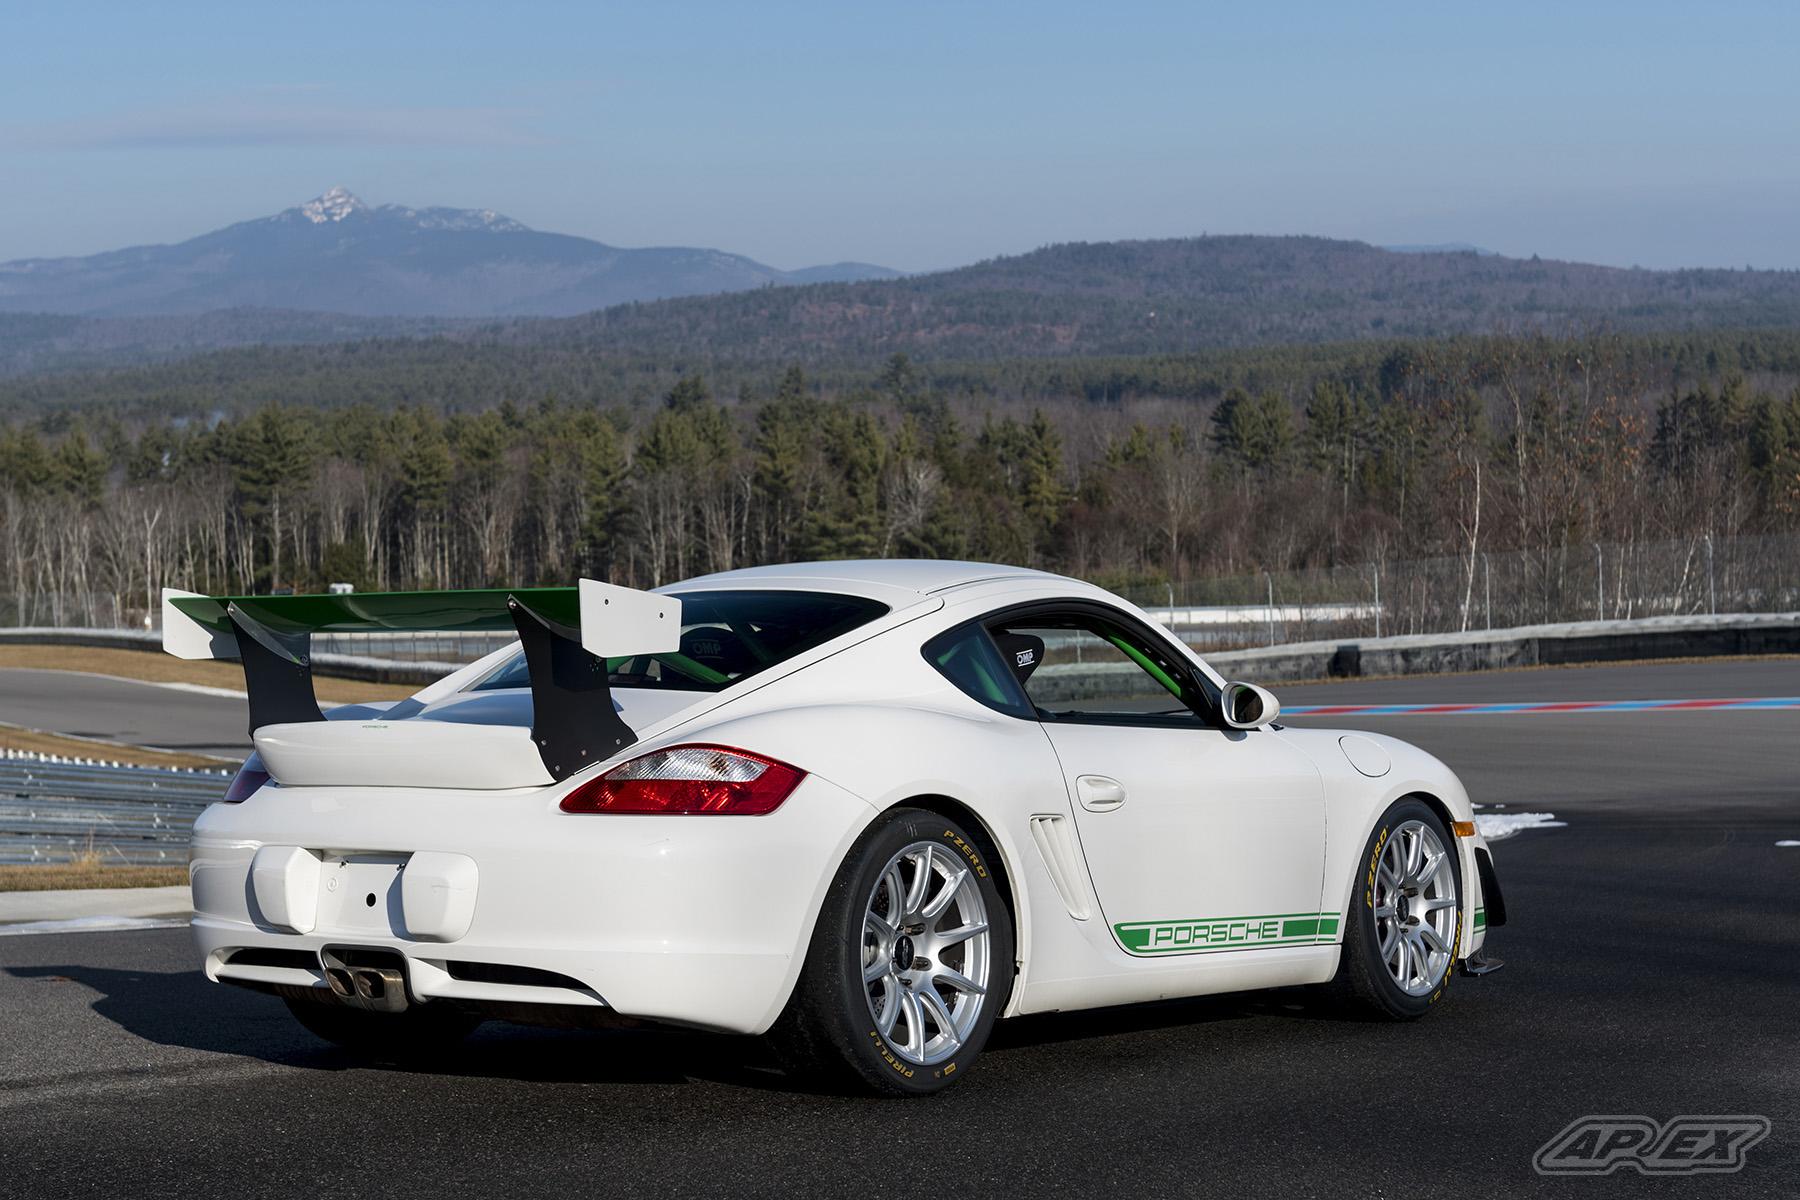 Kachel Motor Company Porsche 987 Cayman Race Car with APEX SM-10 Wheels